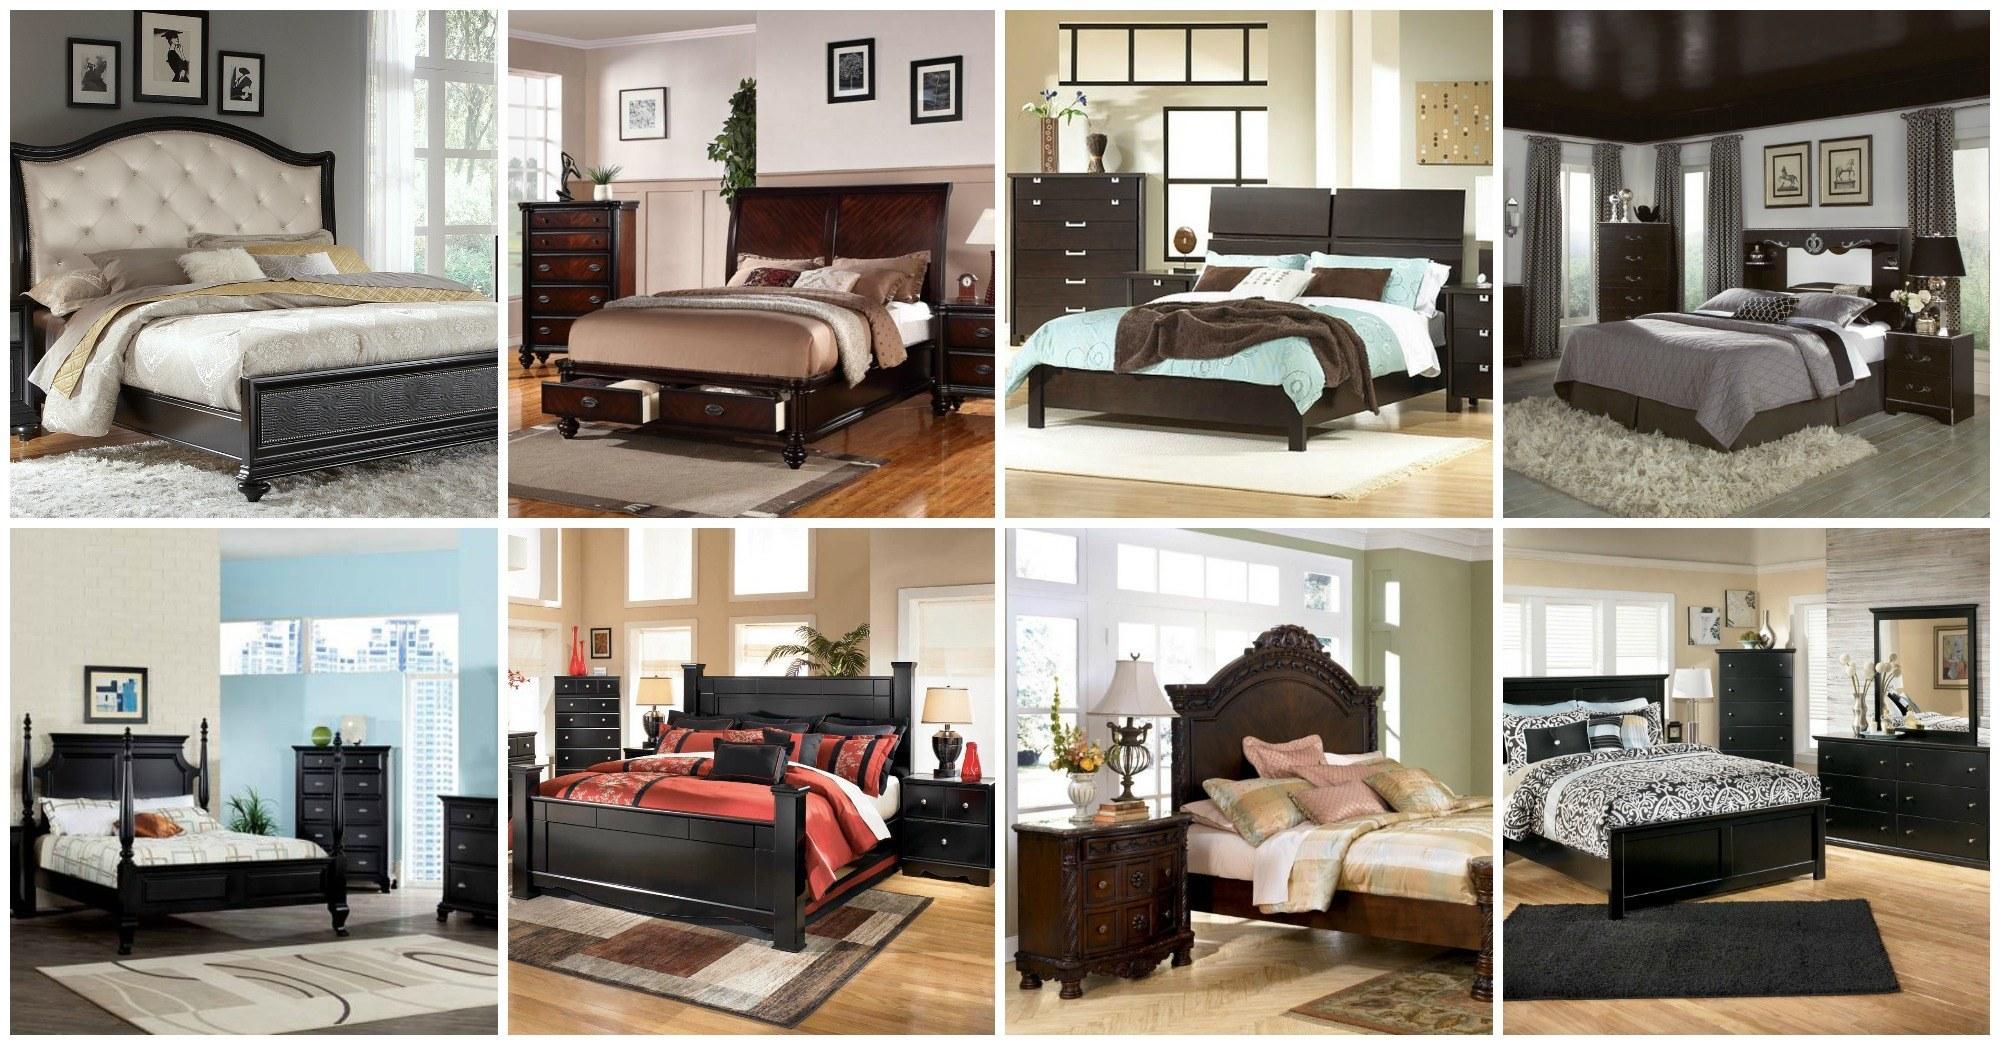 Top 8 Dark Wood Bedroom Furniture Ideas